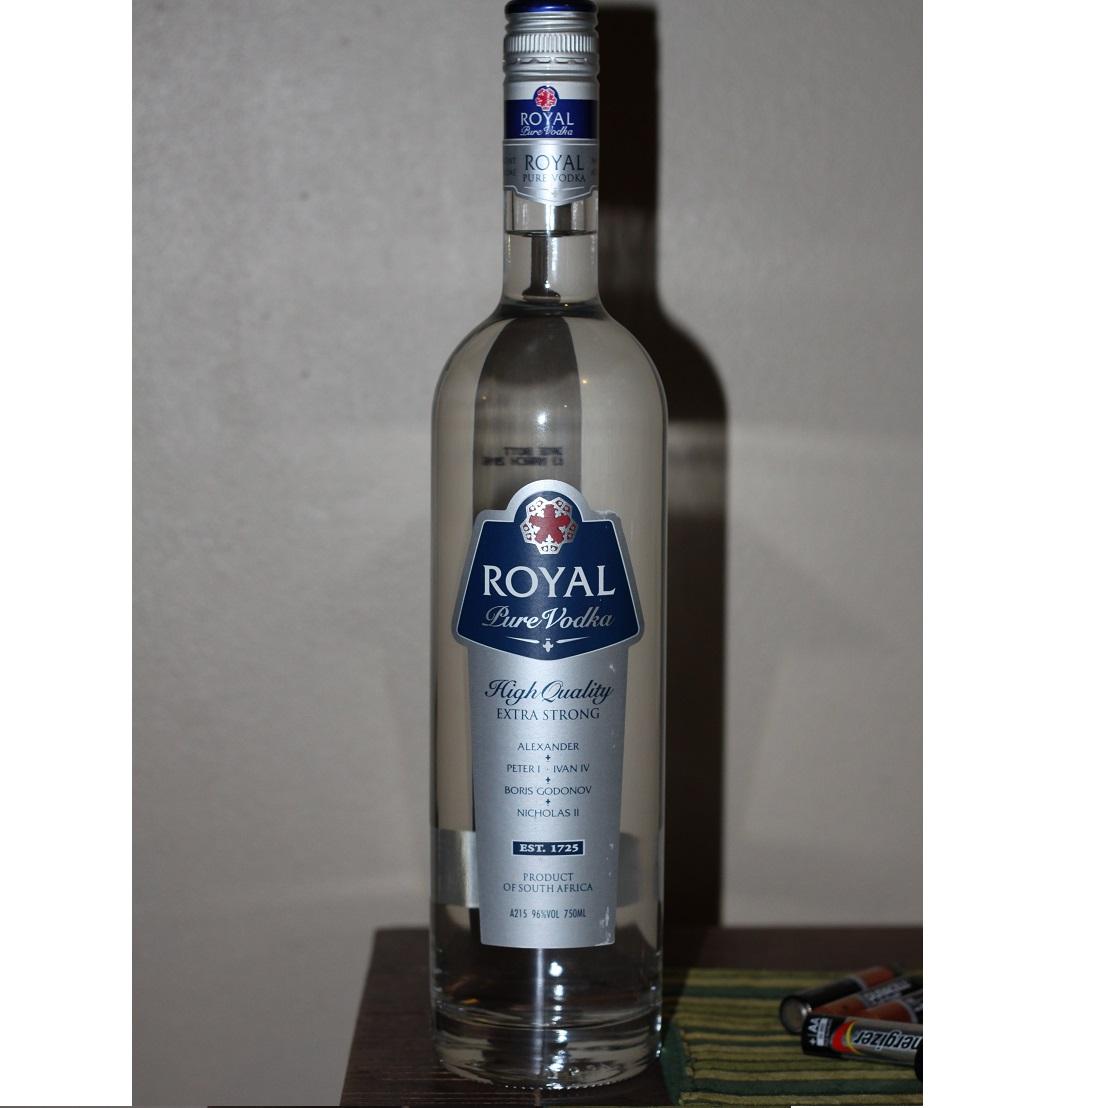 Vodka Drink Alcohol Percentage